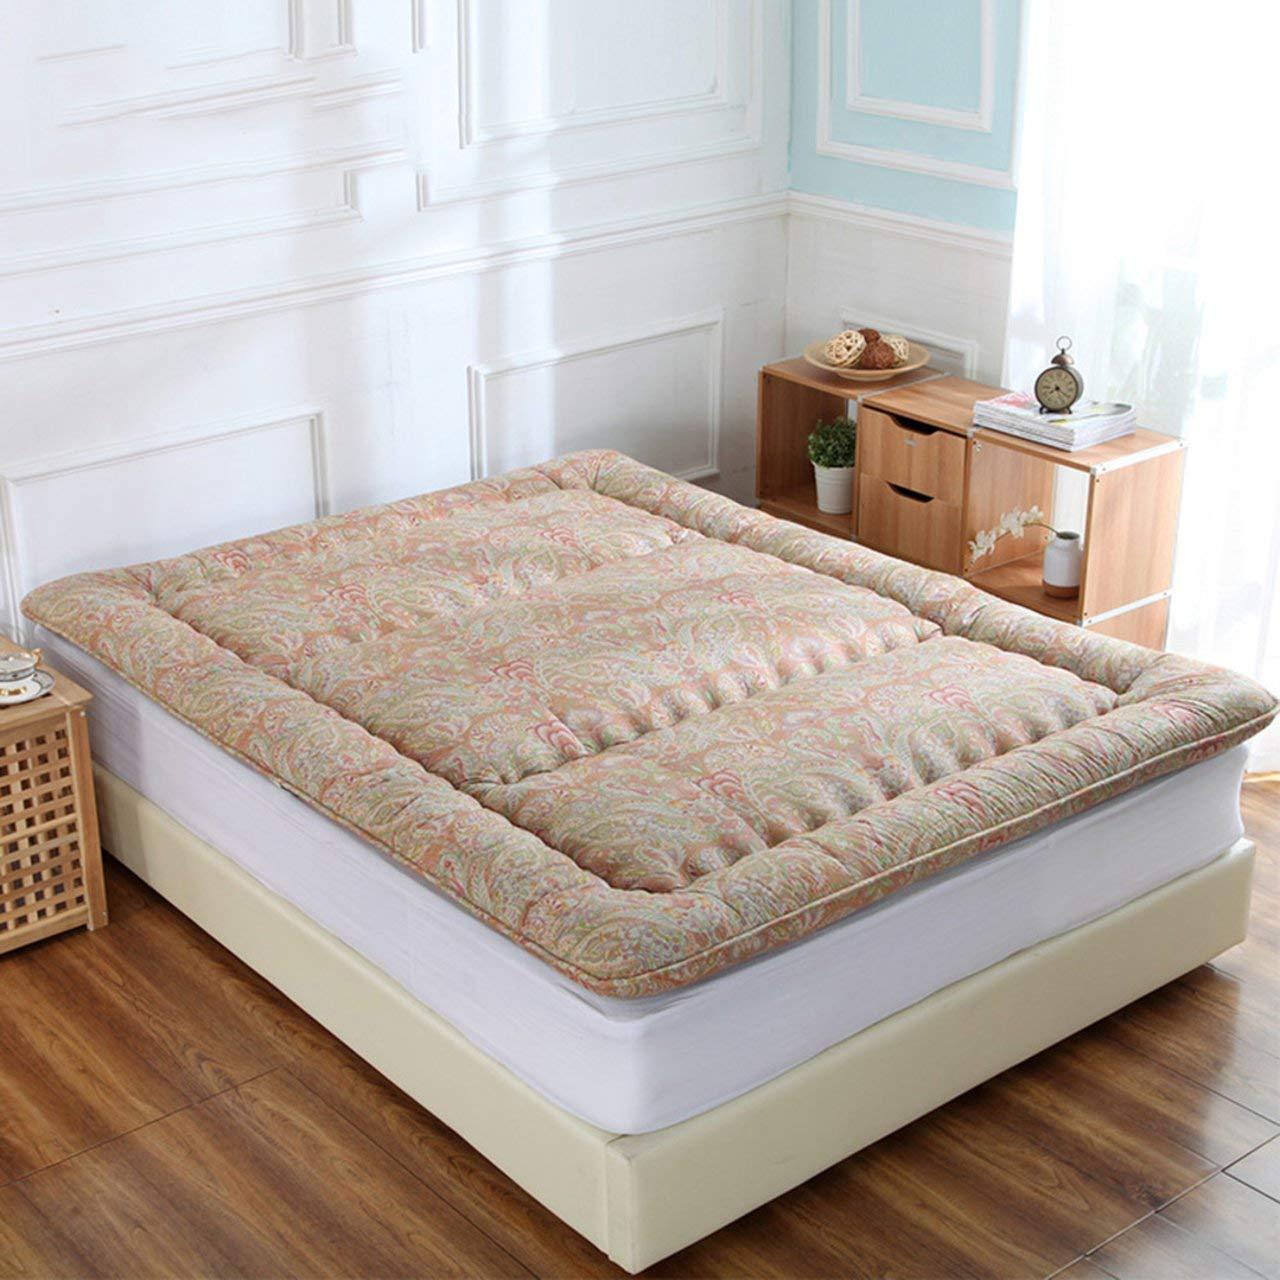 Xing Tatami Matratzenbezug Matratze, Faltbare Kissen Matten warm und Feuchtigkeit tragbare Gesteppte Test Creeping Mat Pad-A 180x200cm (71x79inch)